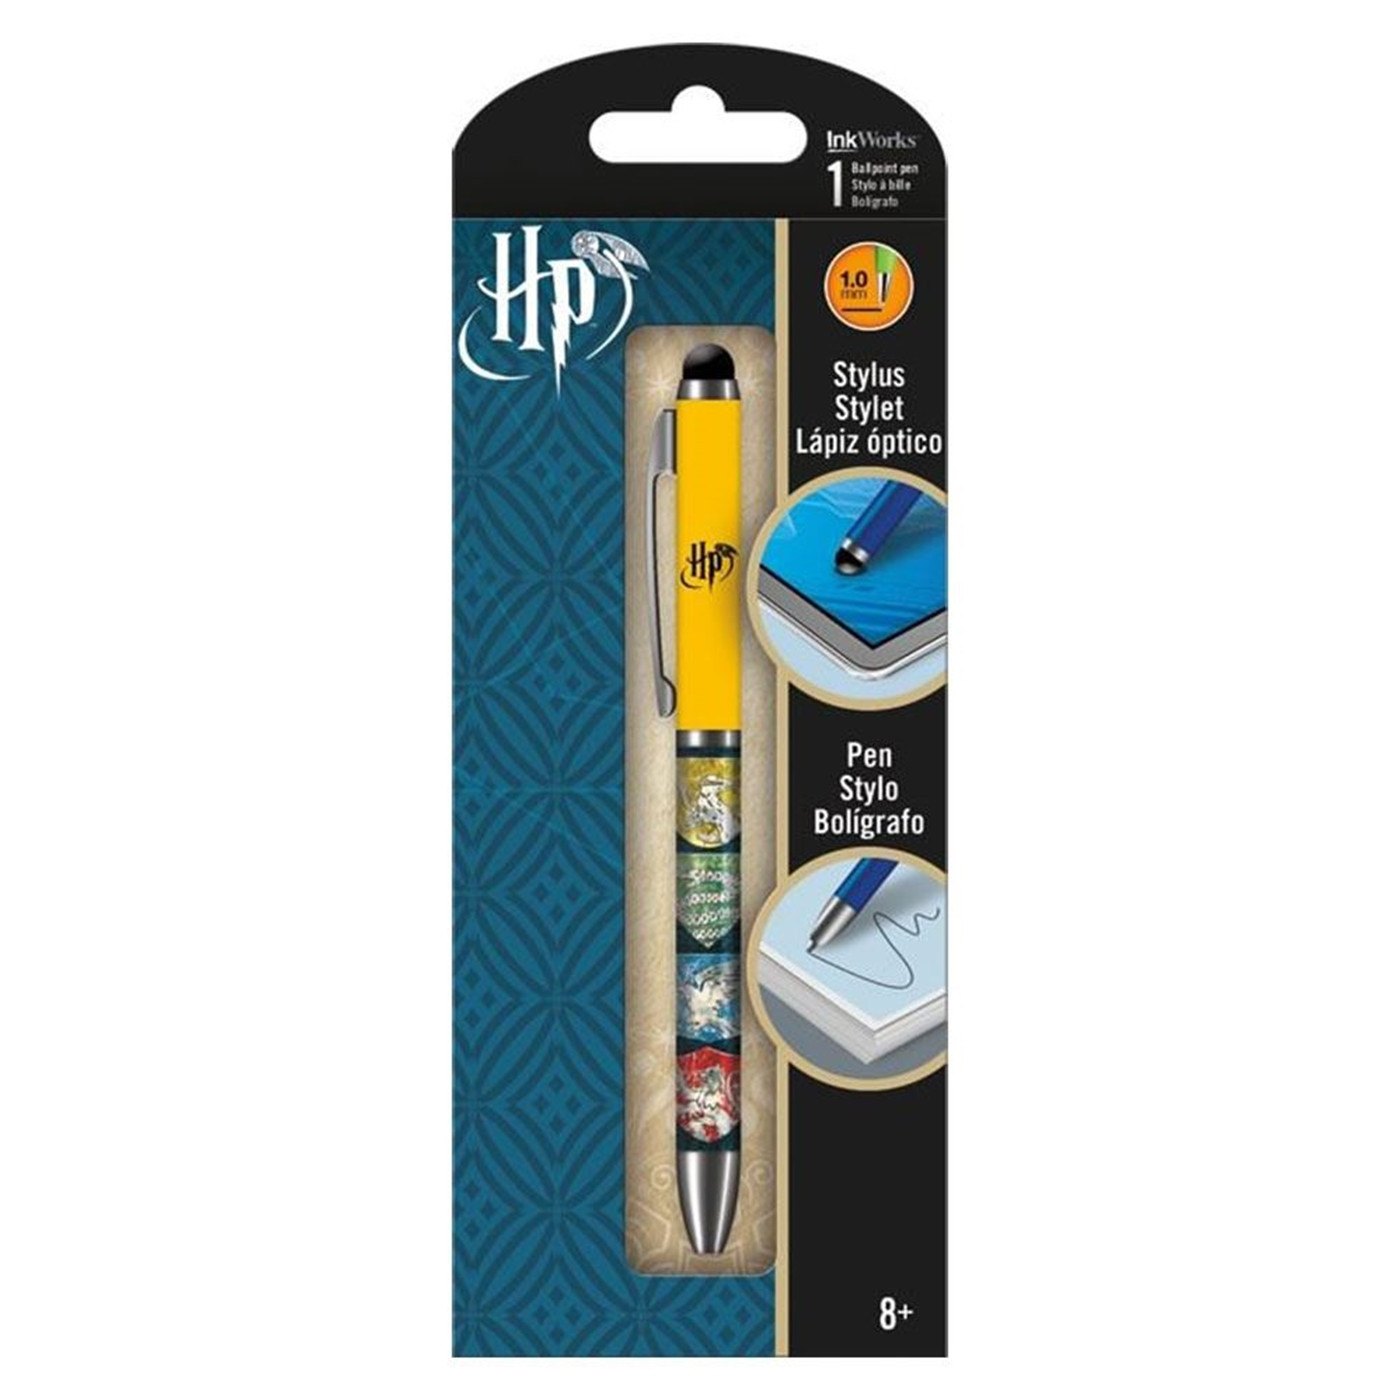 Harry Potter Stylus Pen